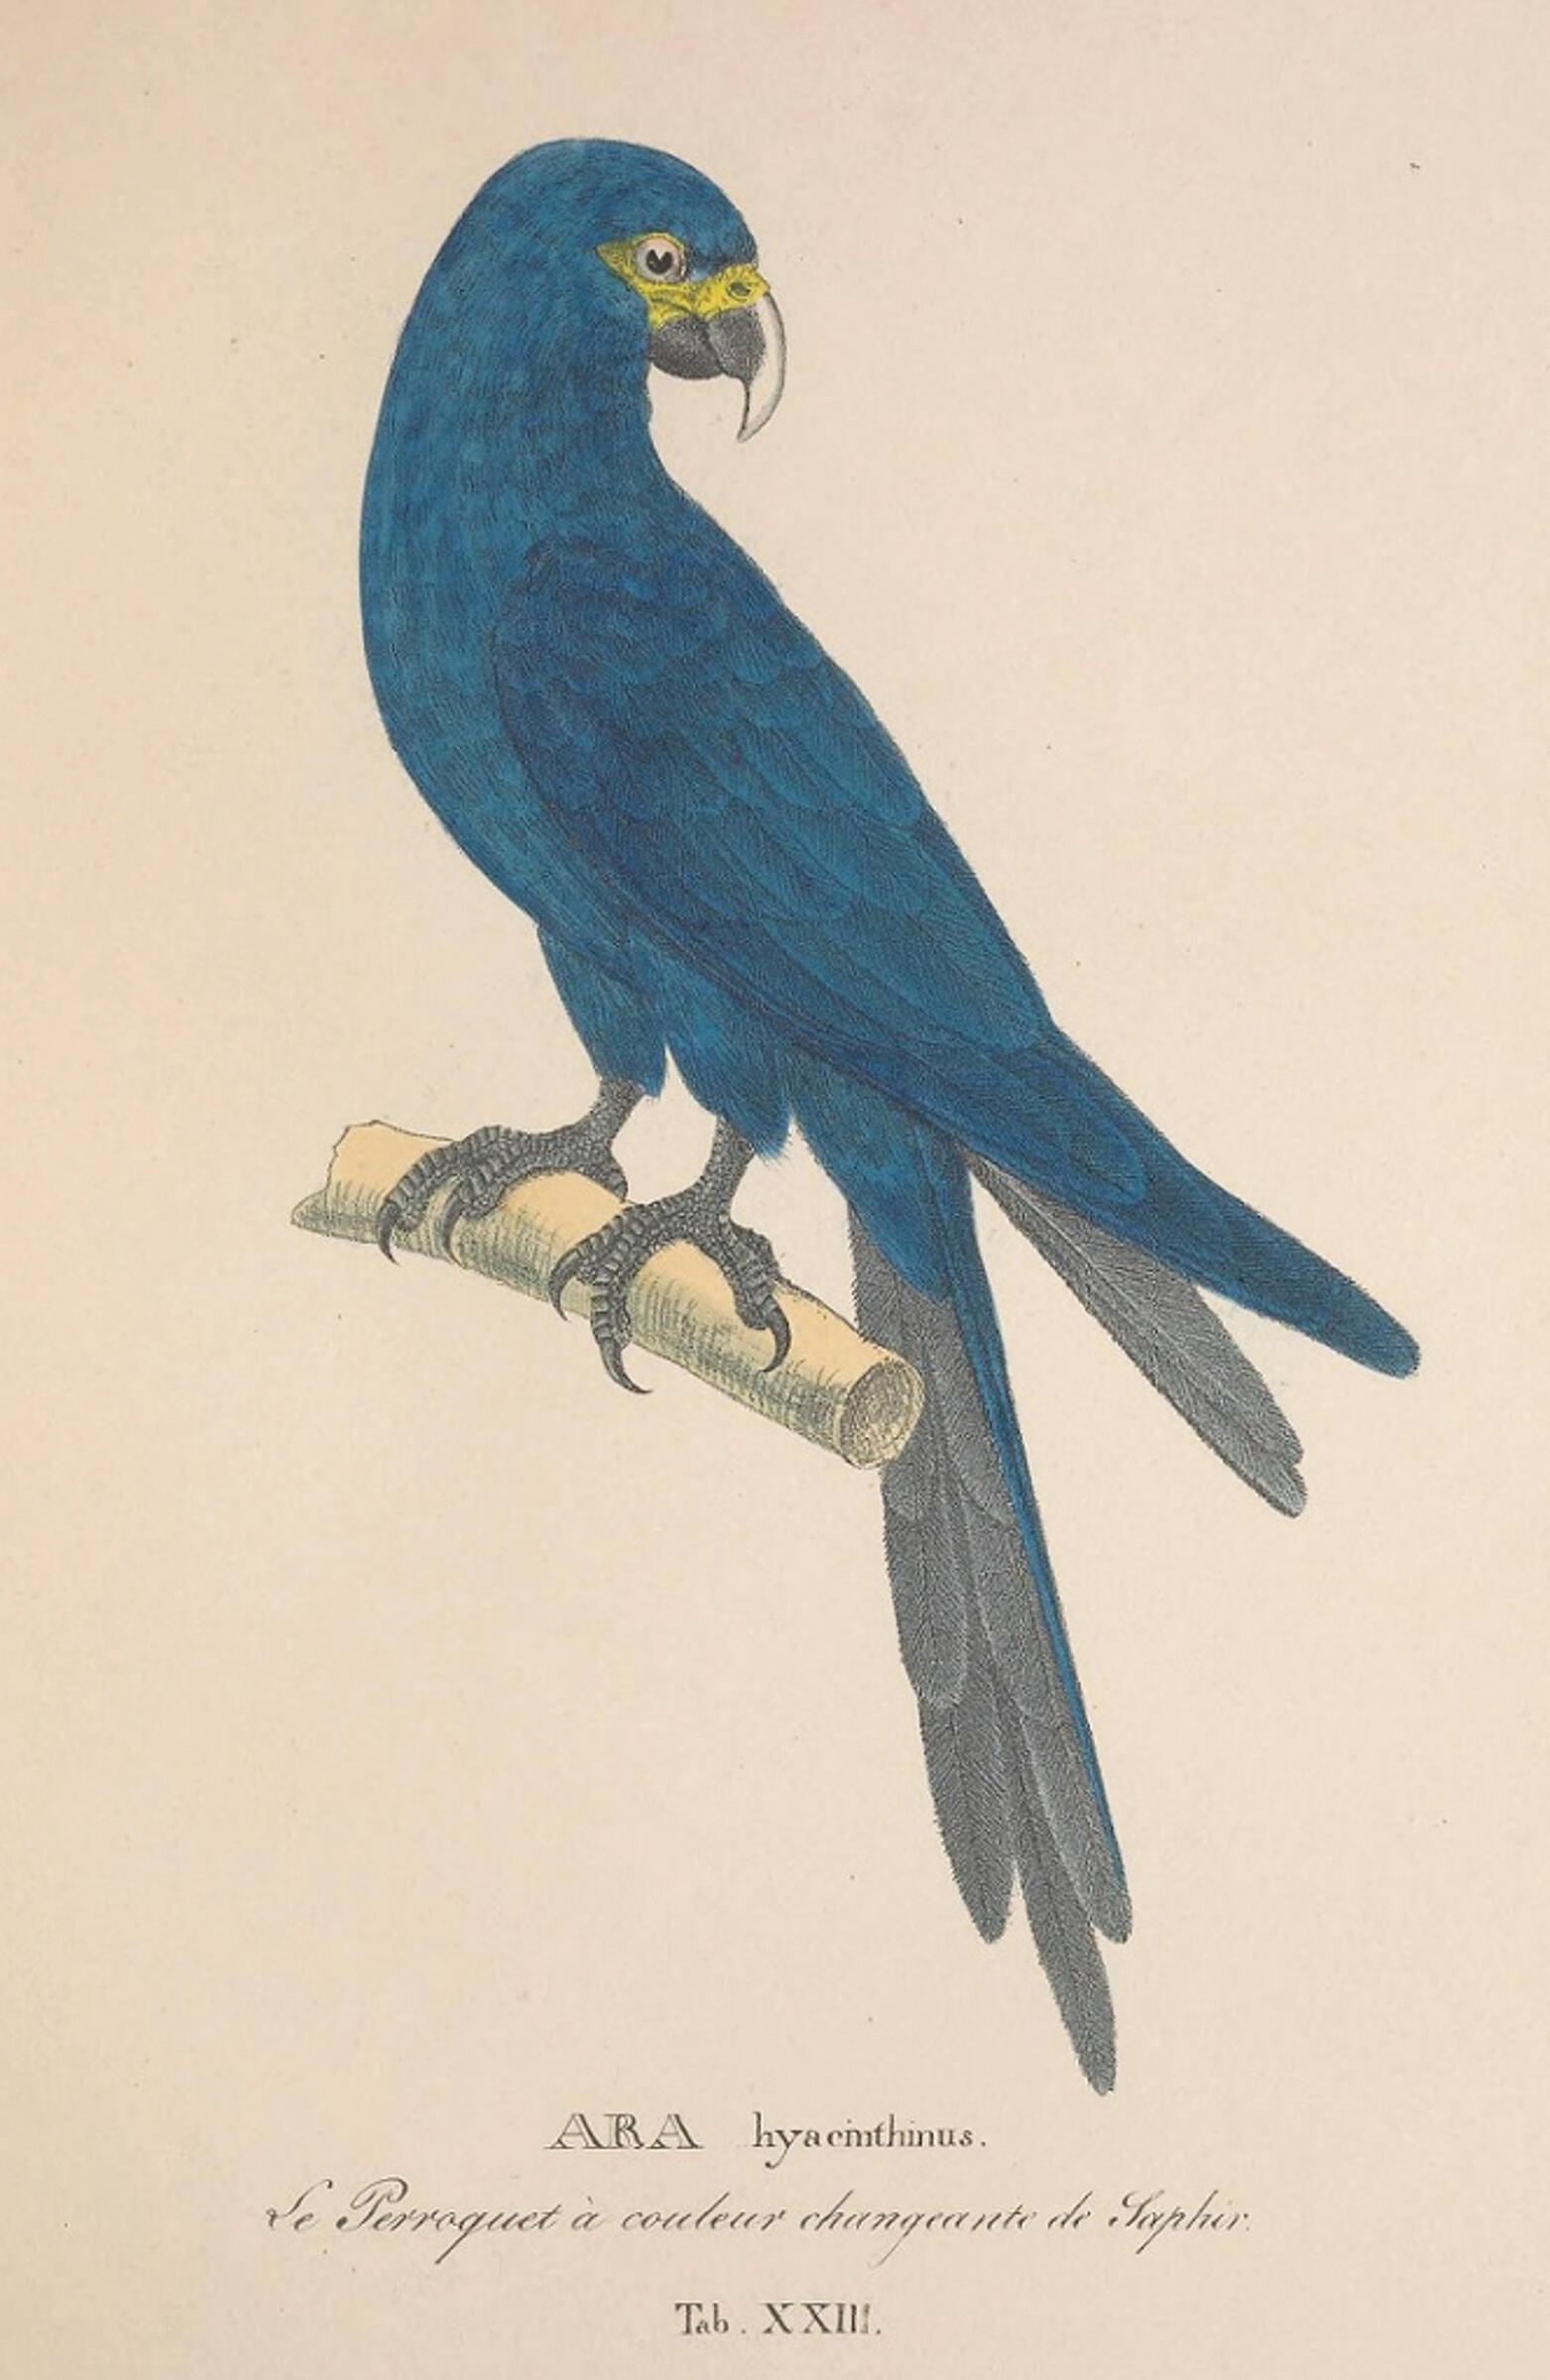 Portrait of a juvenile Spix's Macaw by German biologist Johann Baptist Von Spix, for whom the bird is named.